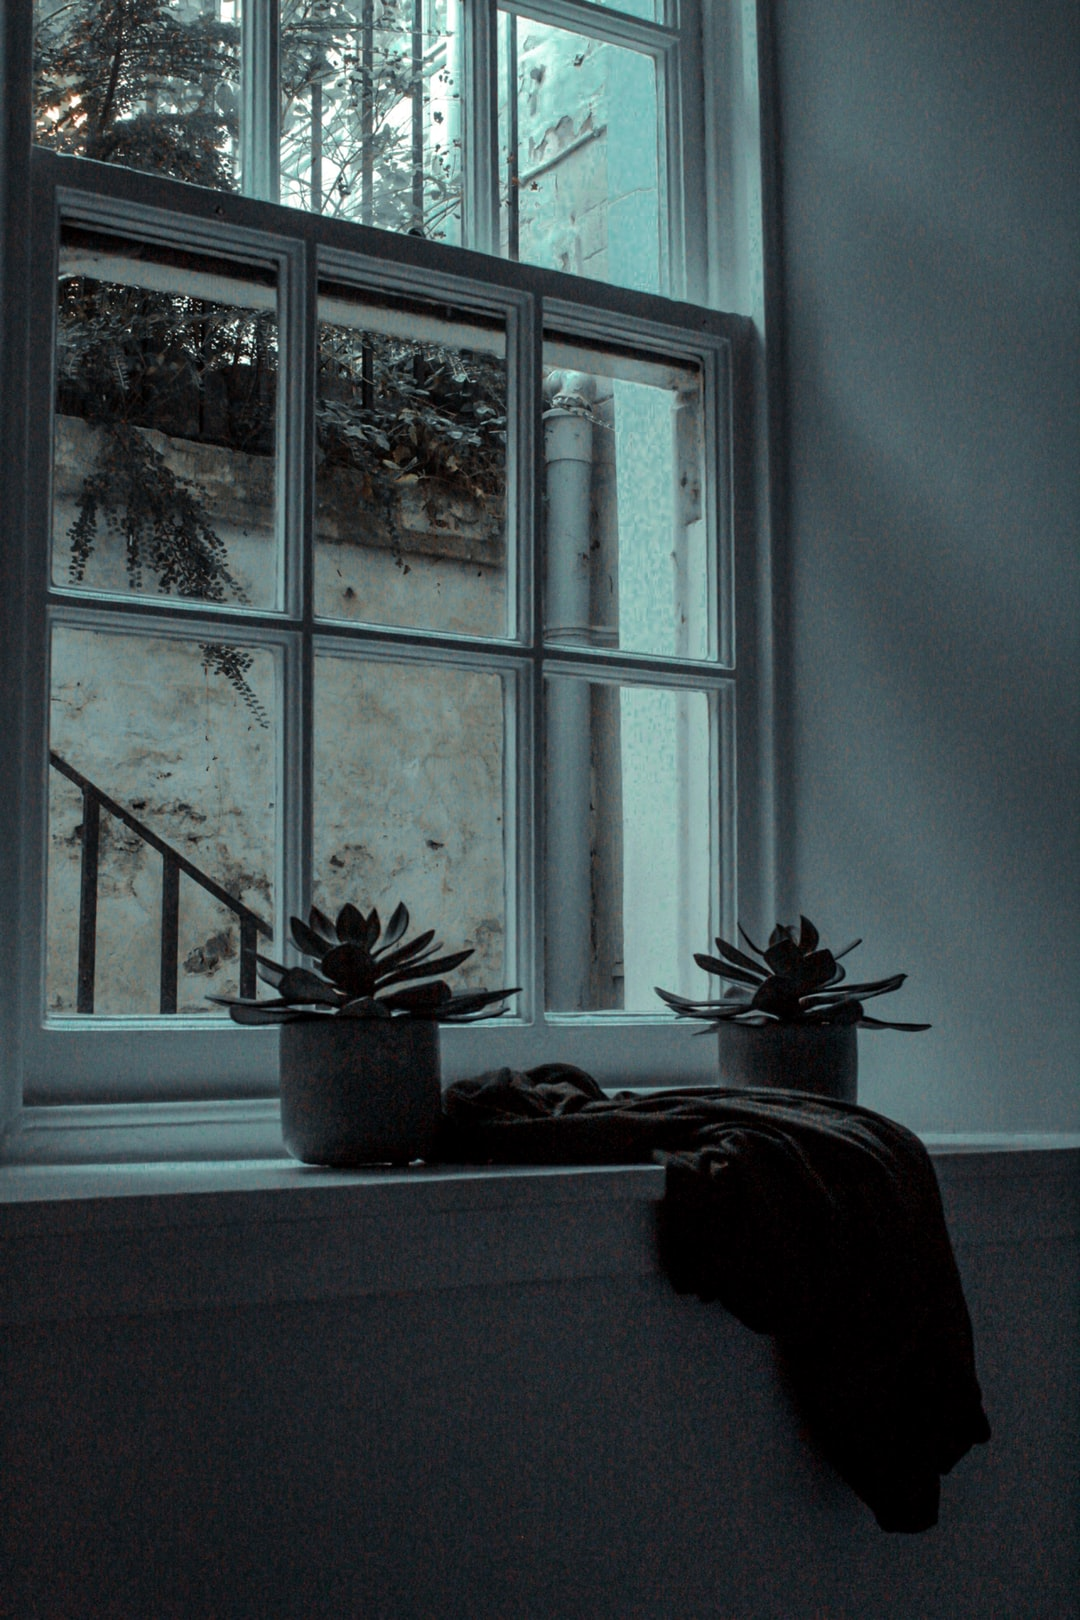 Georgian window sill light with plants and tshirt